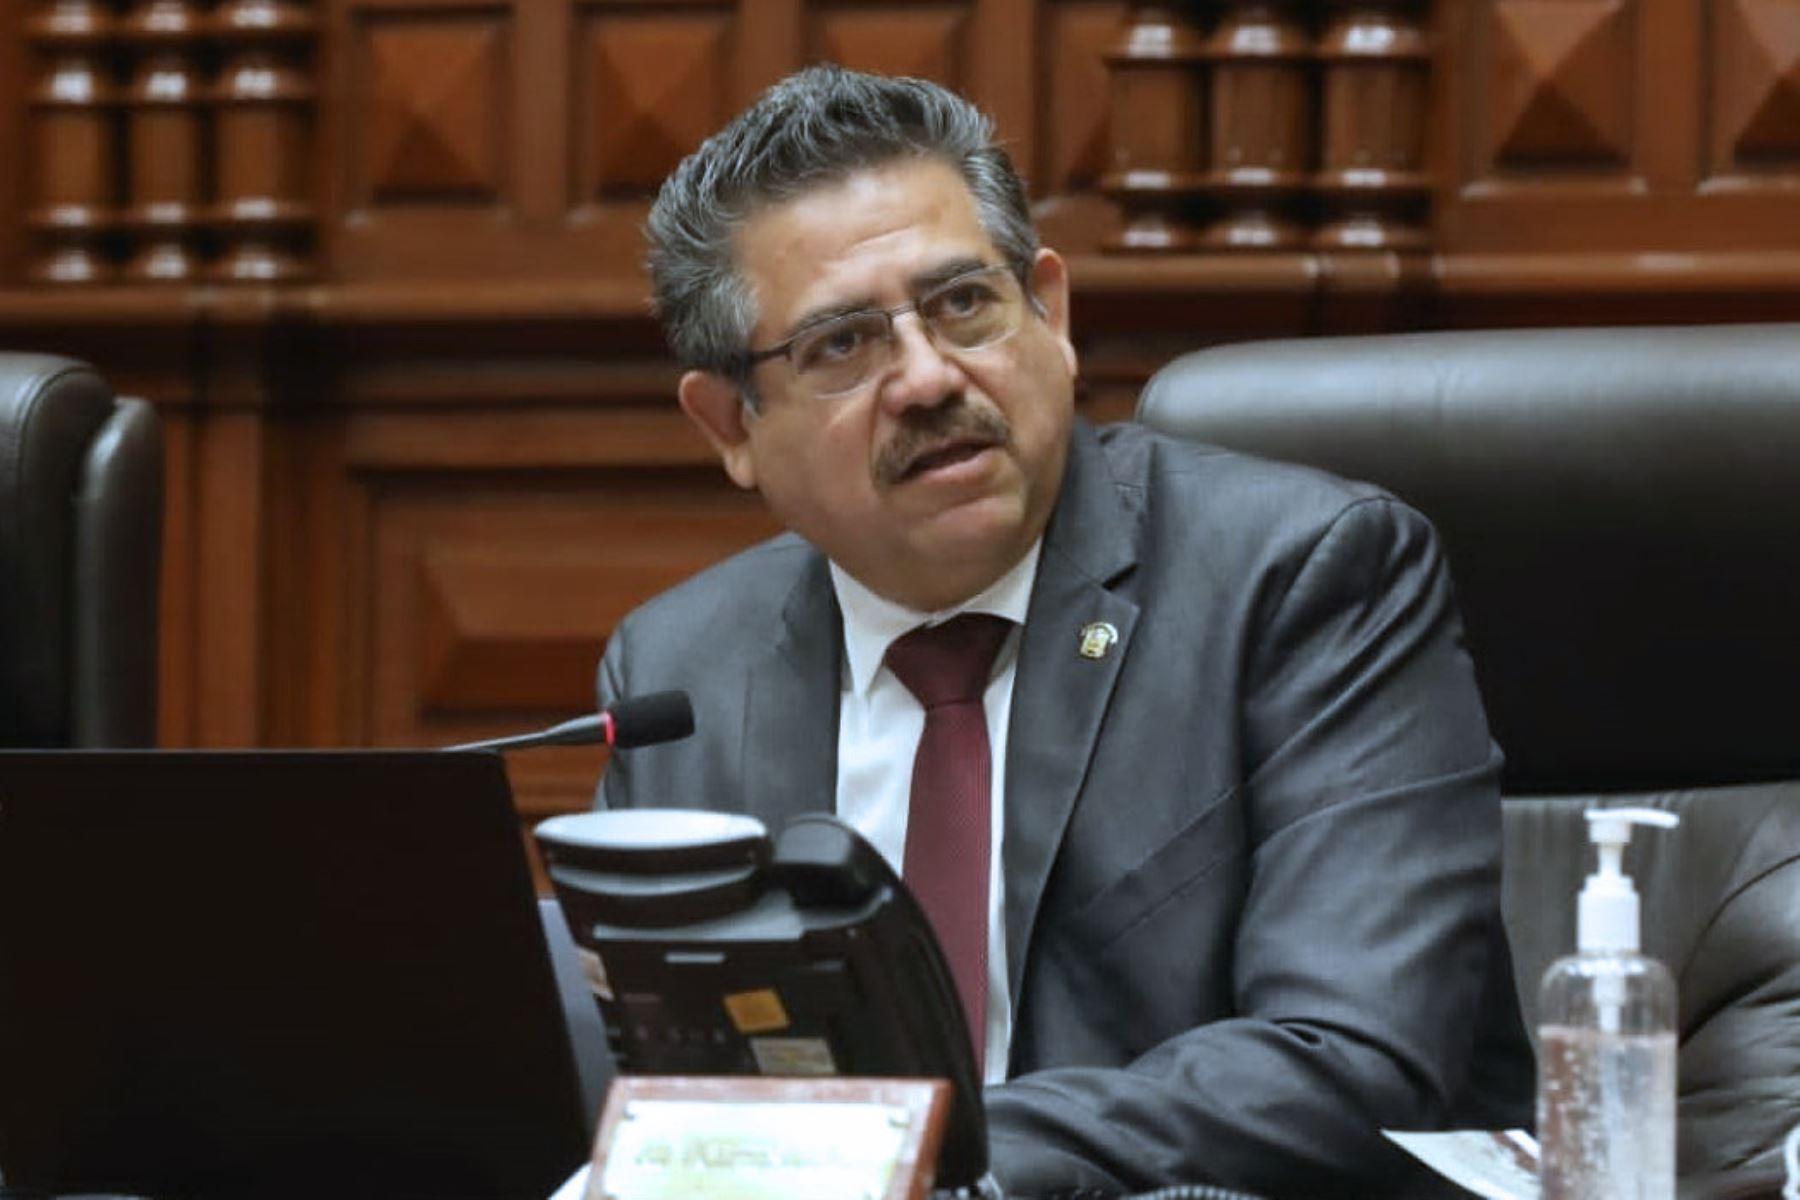 Titular del Congreso posterga debate sobre vacancia presidencial | Noticias